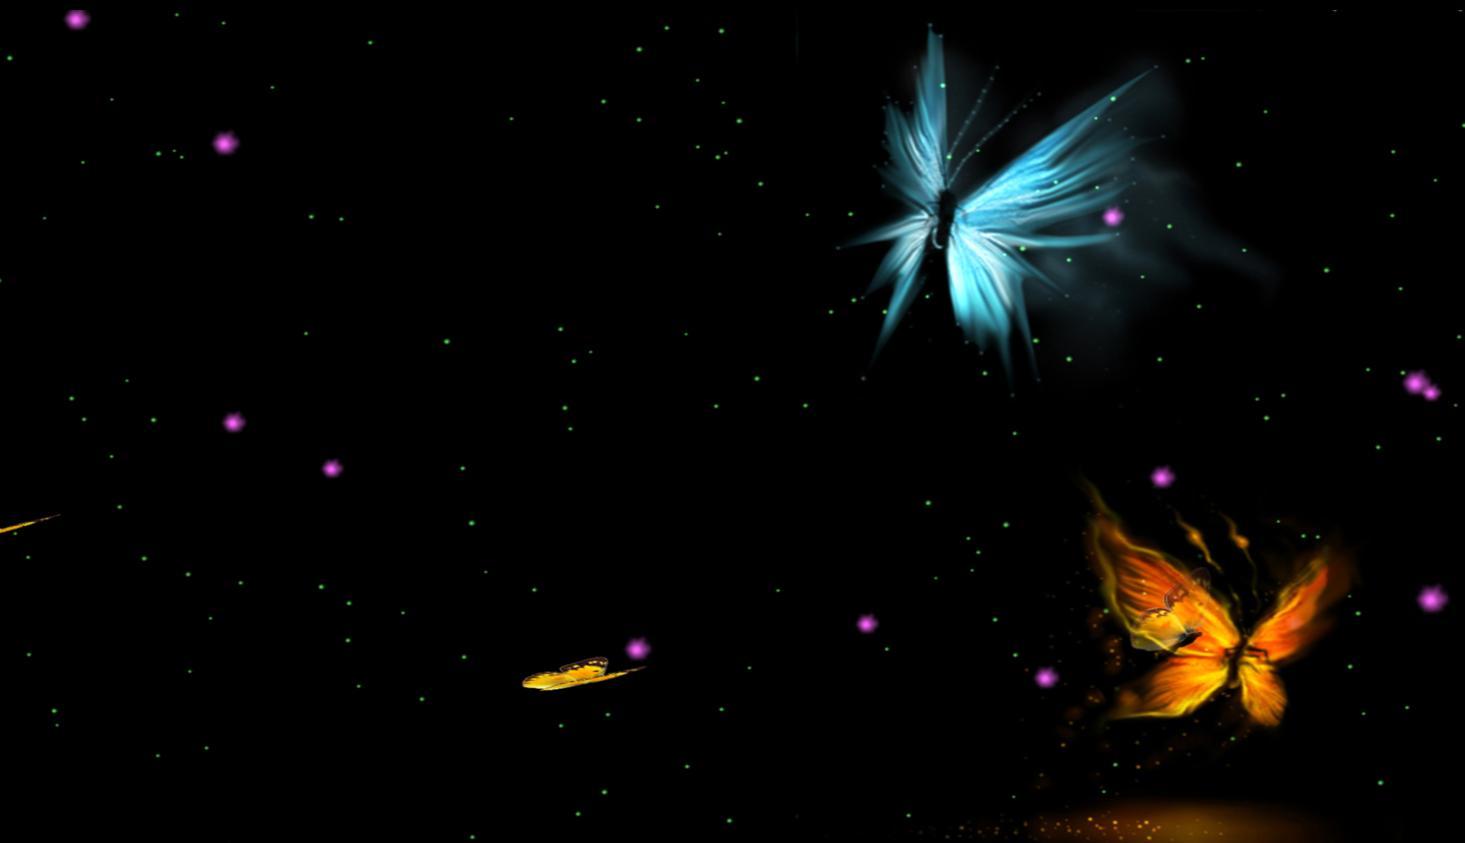 Download Fantastic Butterfly Animated Wallpaper DesktopAnimatedcom 1465x843